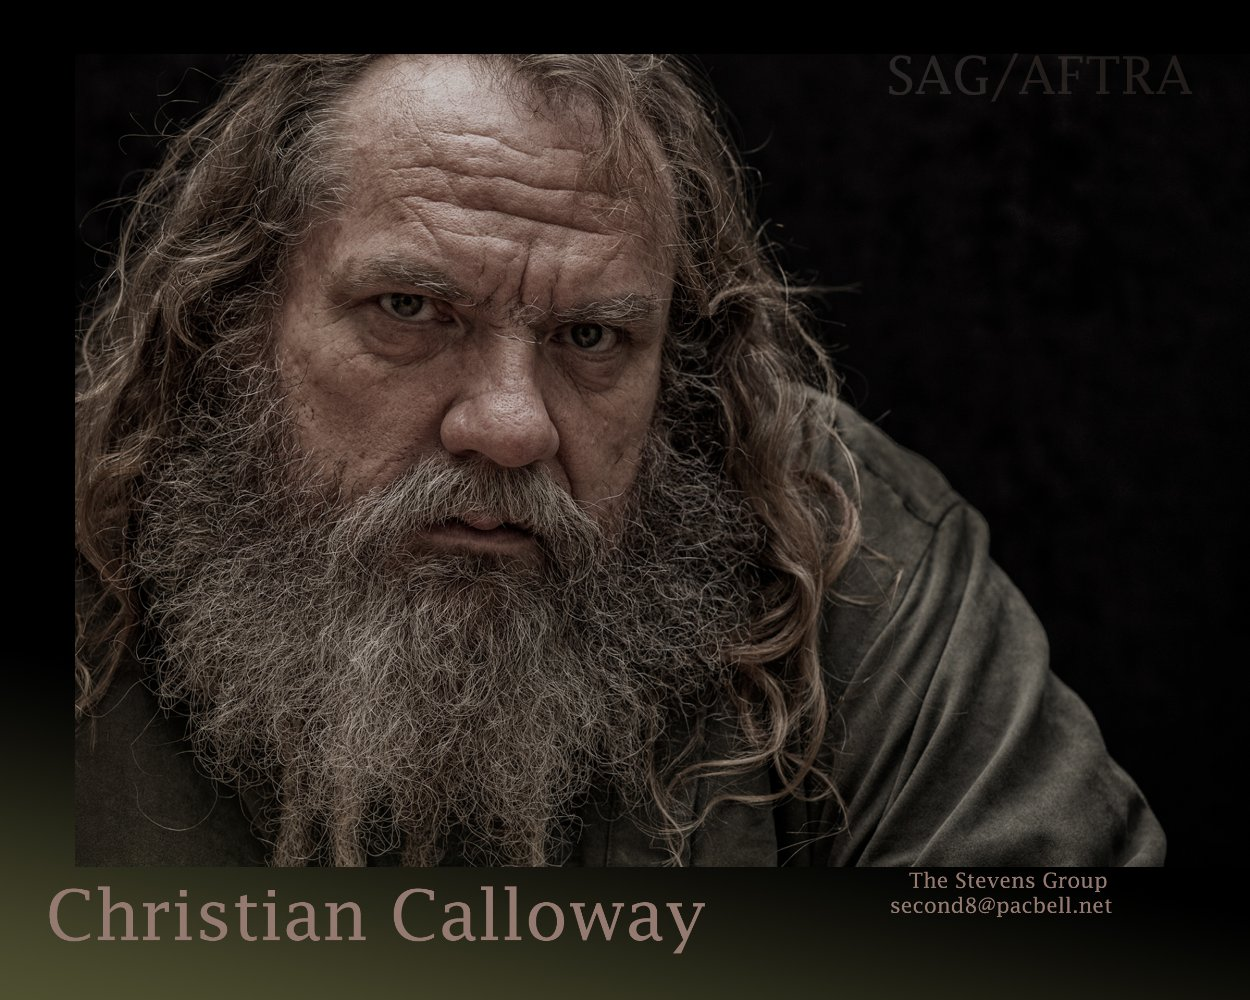 Christian Calloway